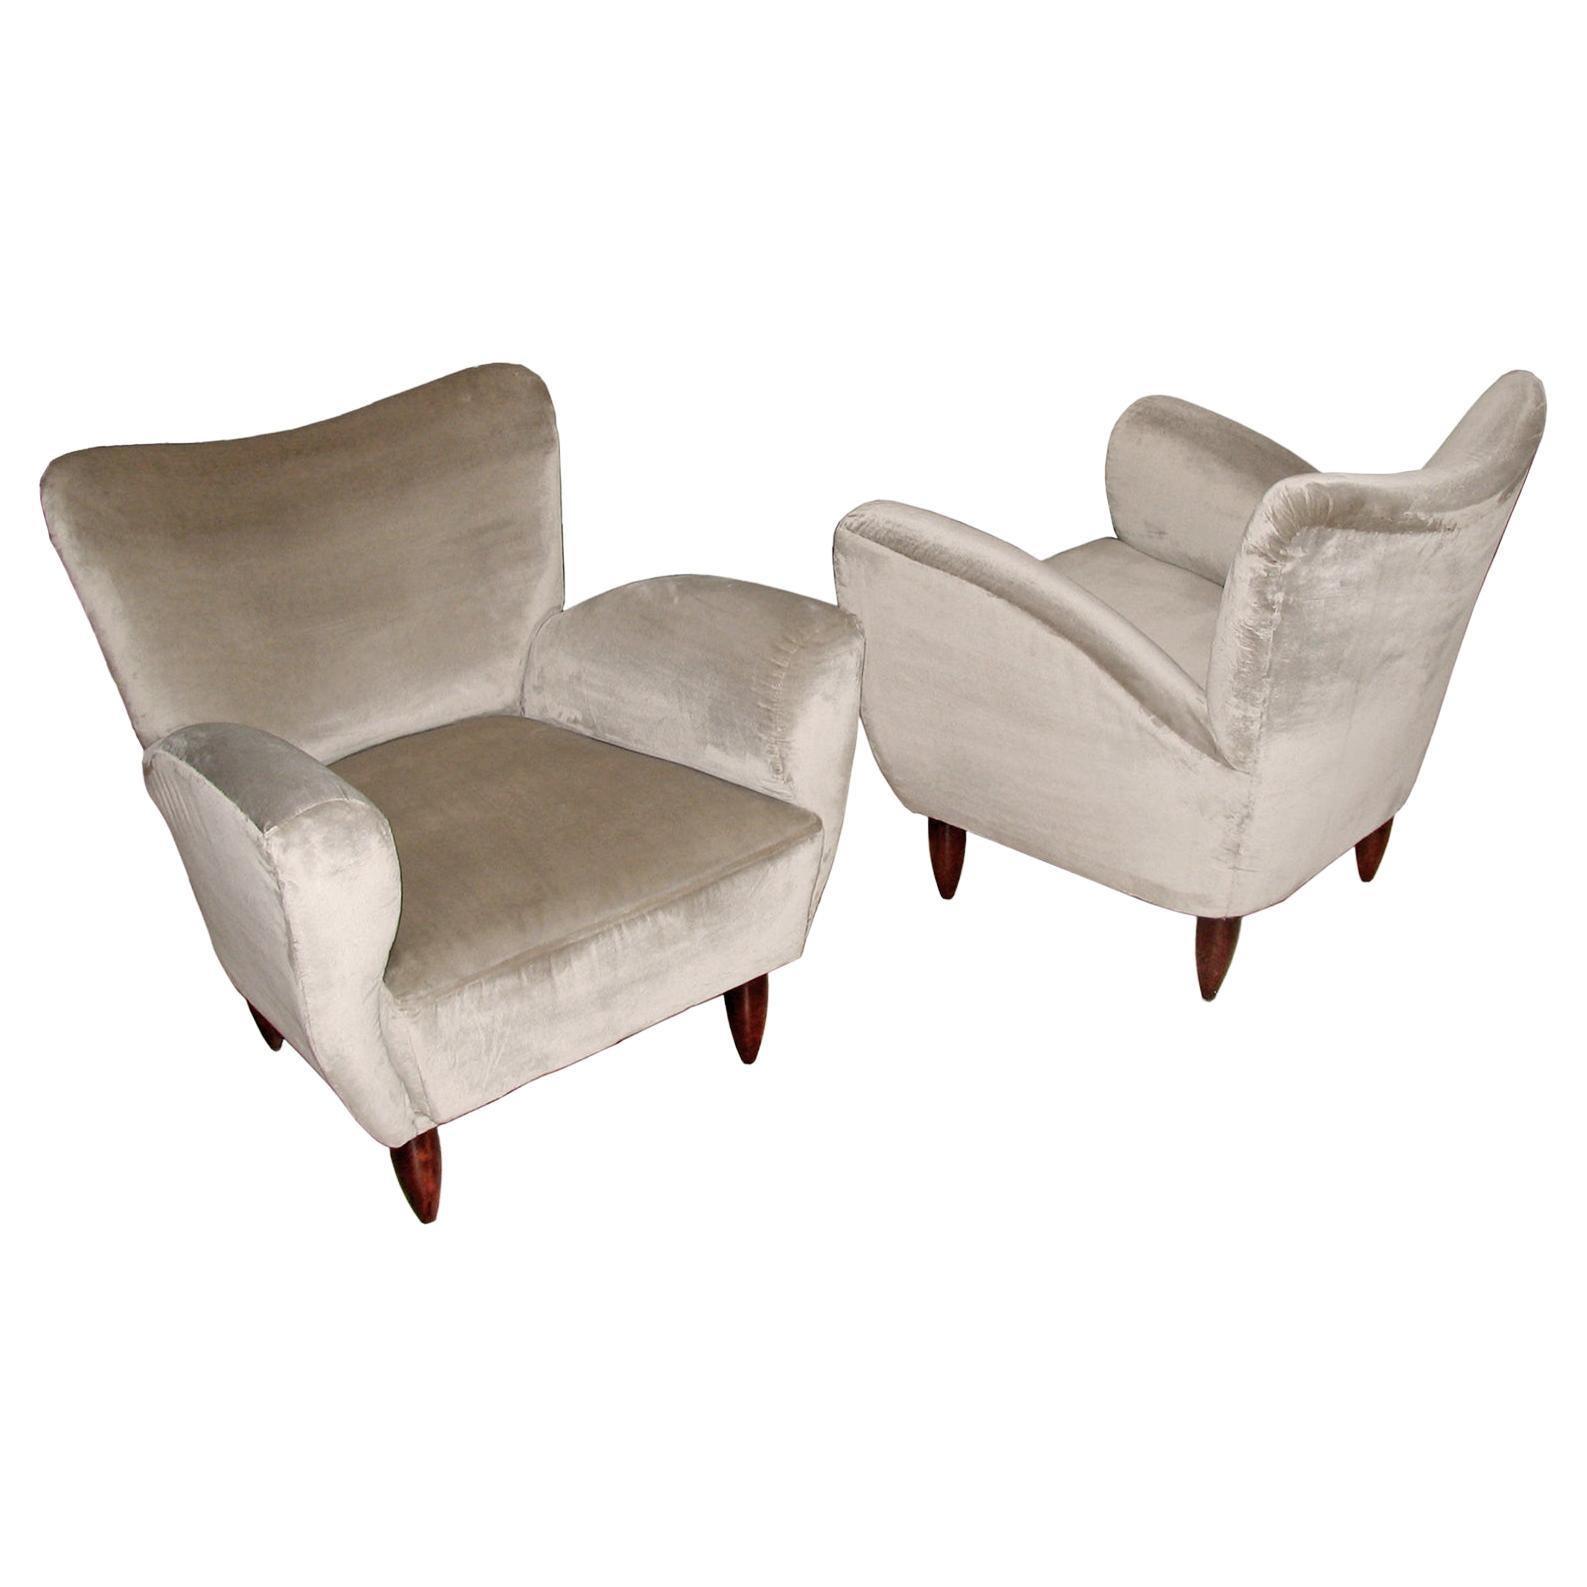 Pair of Italian Armchairs Reupholstered in Luxurious Velvet